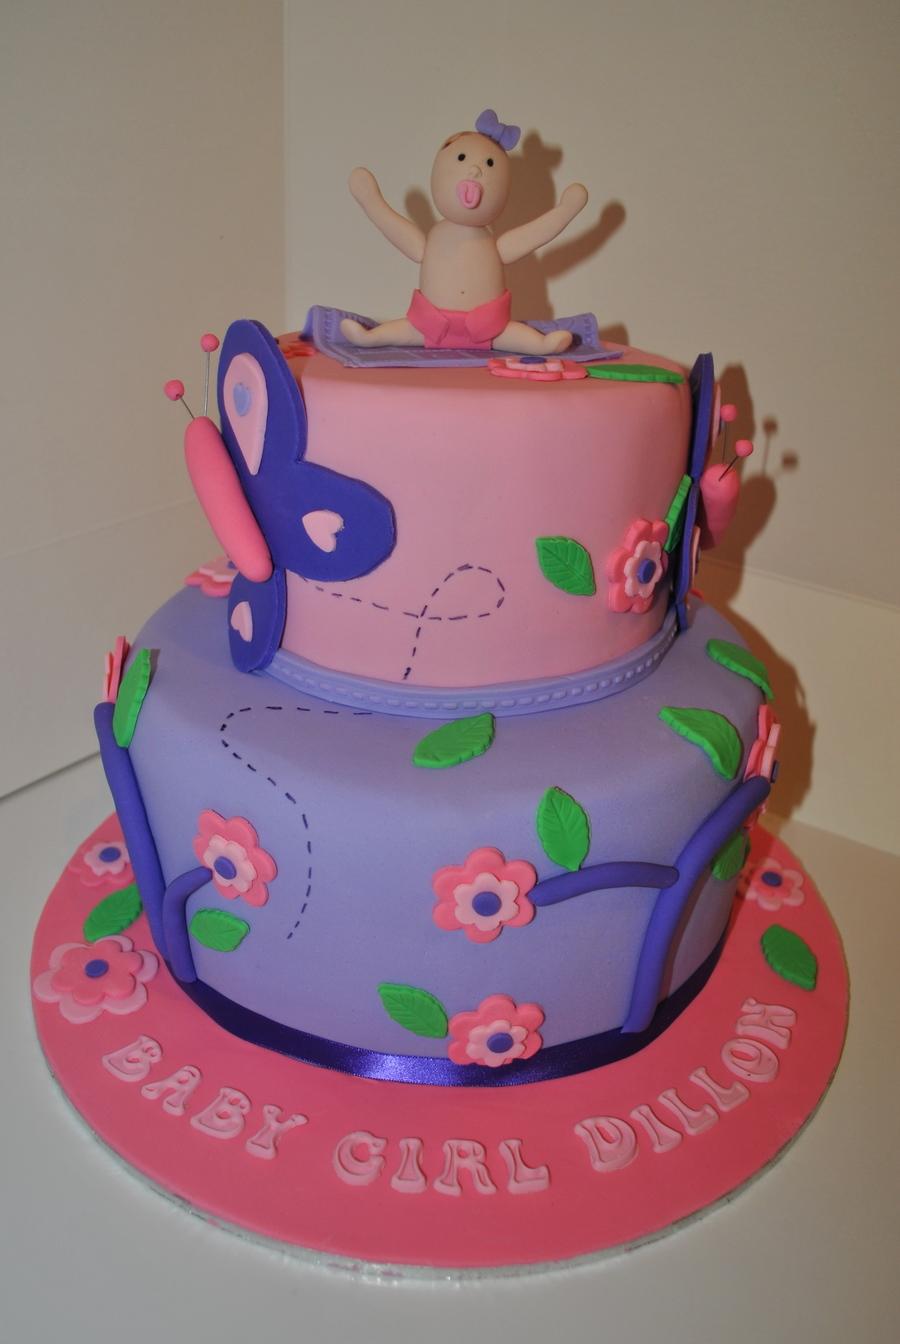 Butterfly Flower Baby Shower Cake